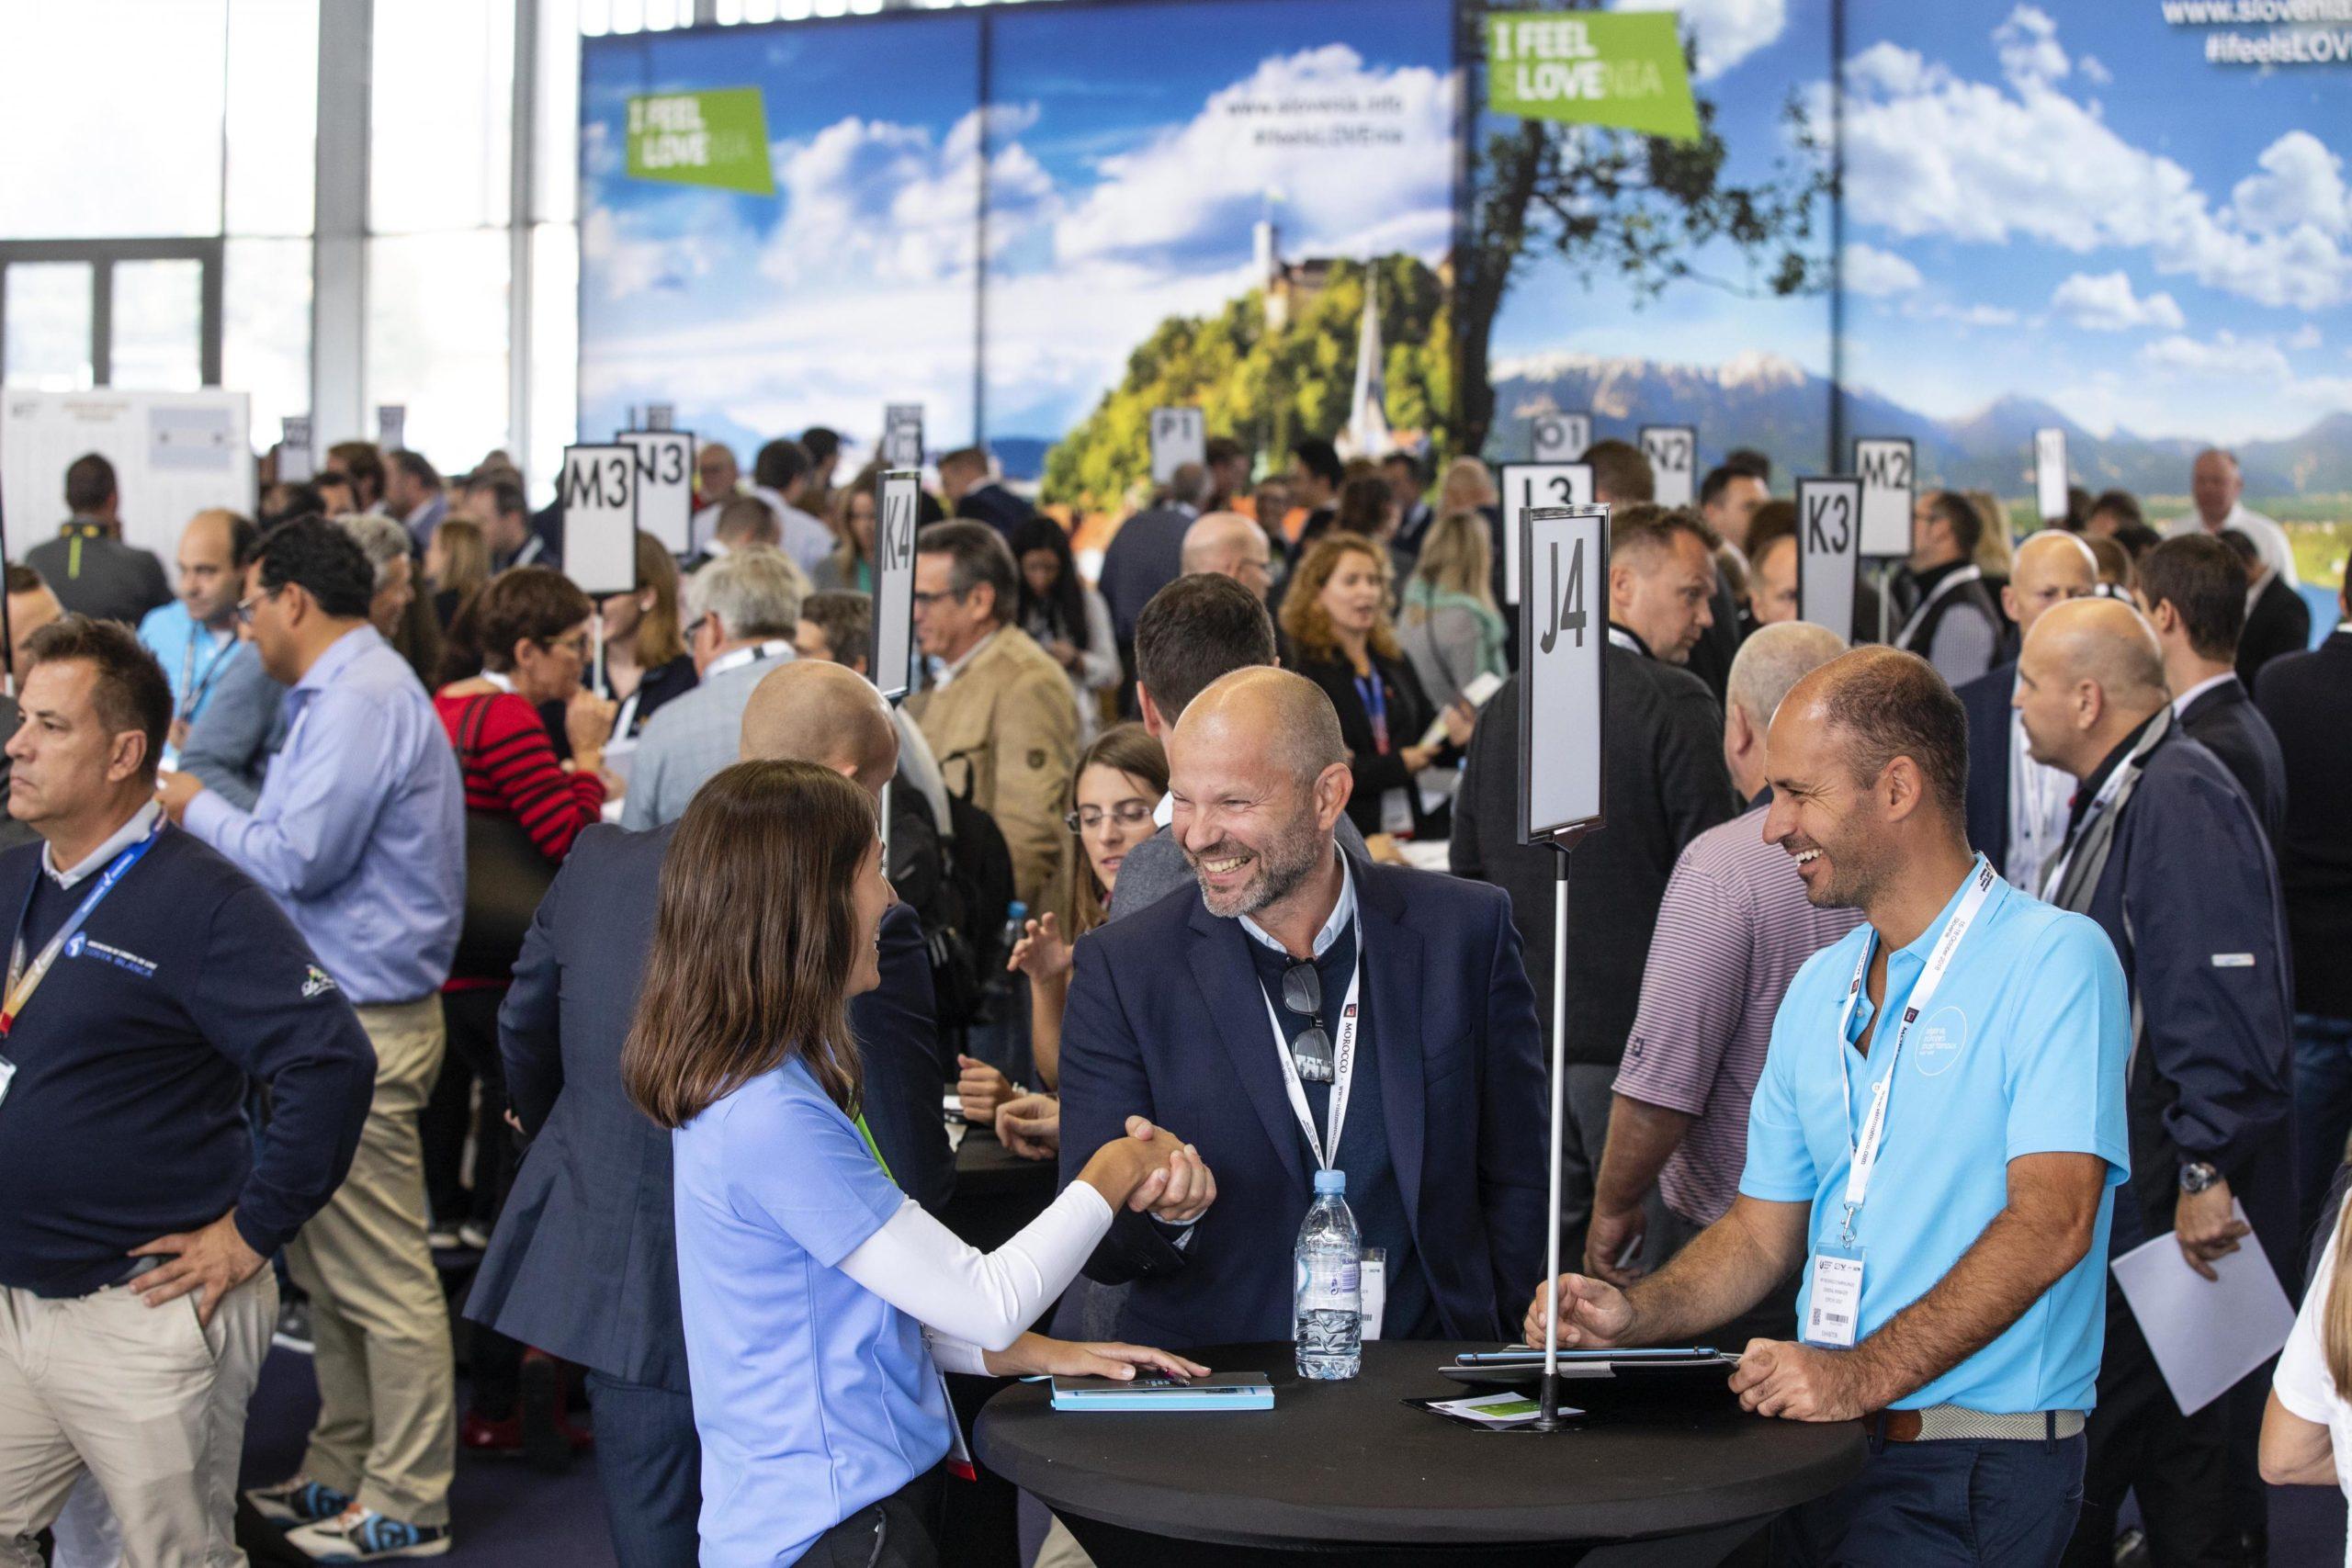 International Golf Travel Market in Wales postponed until 2021